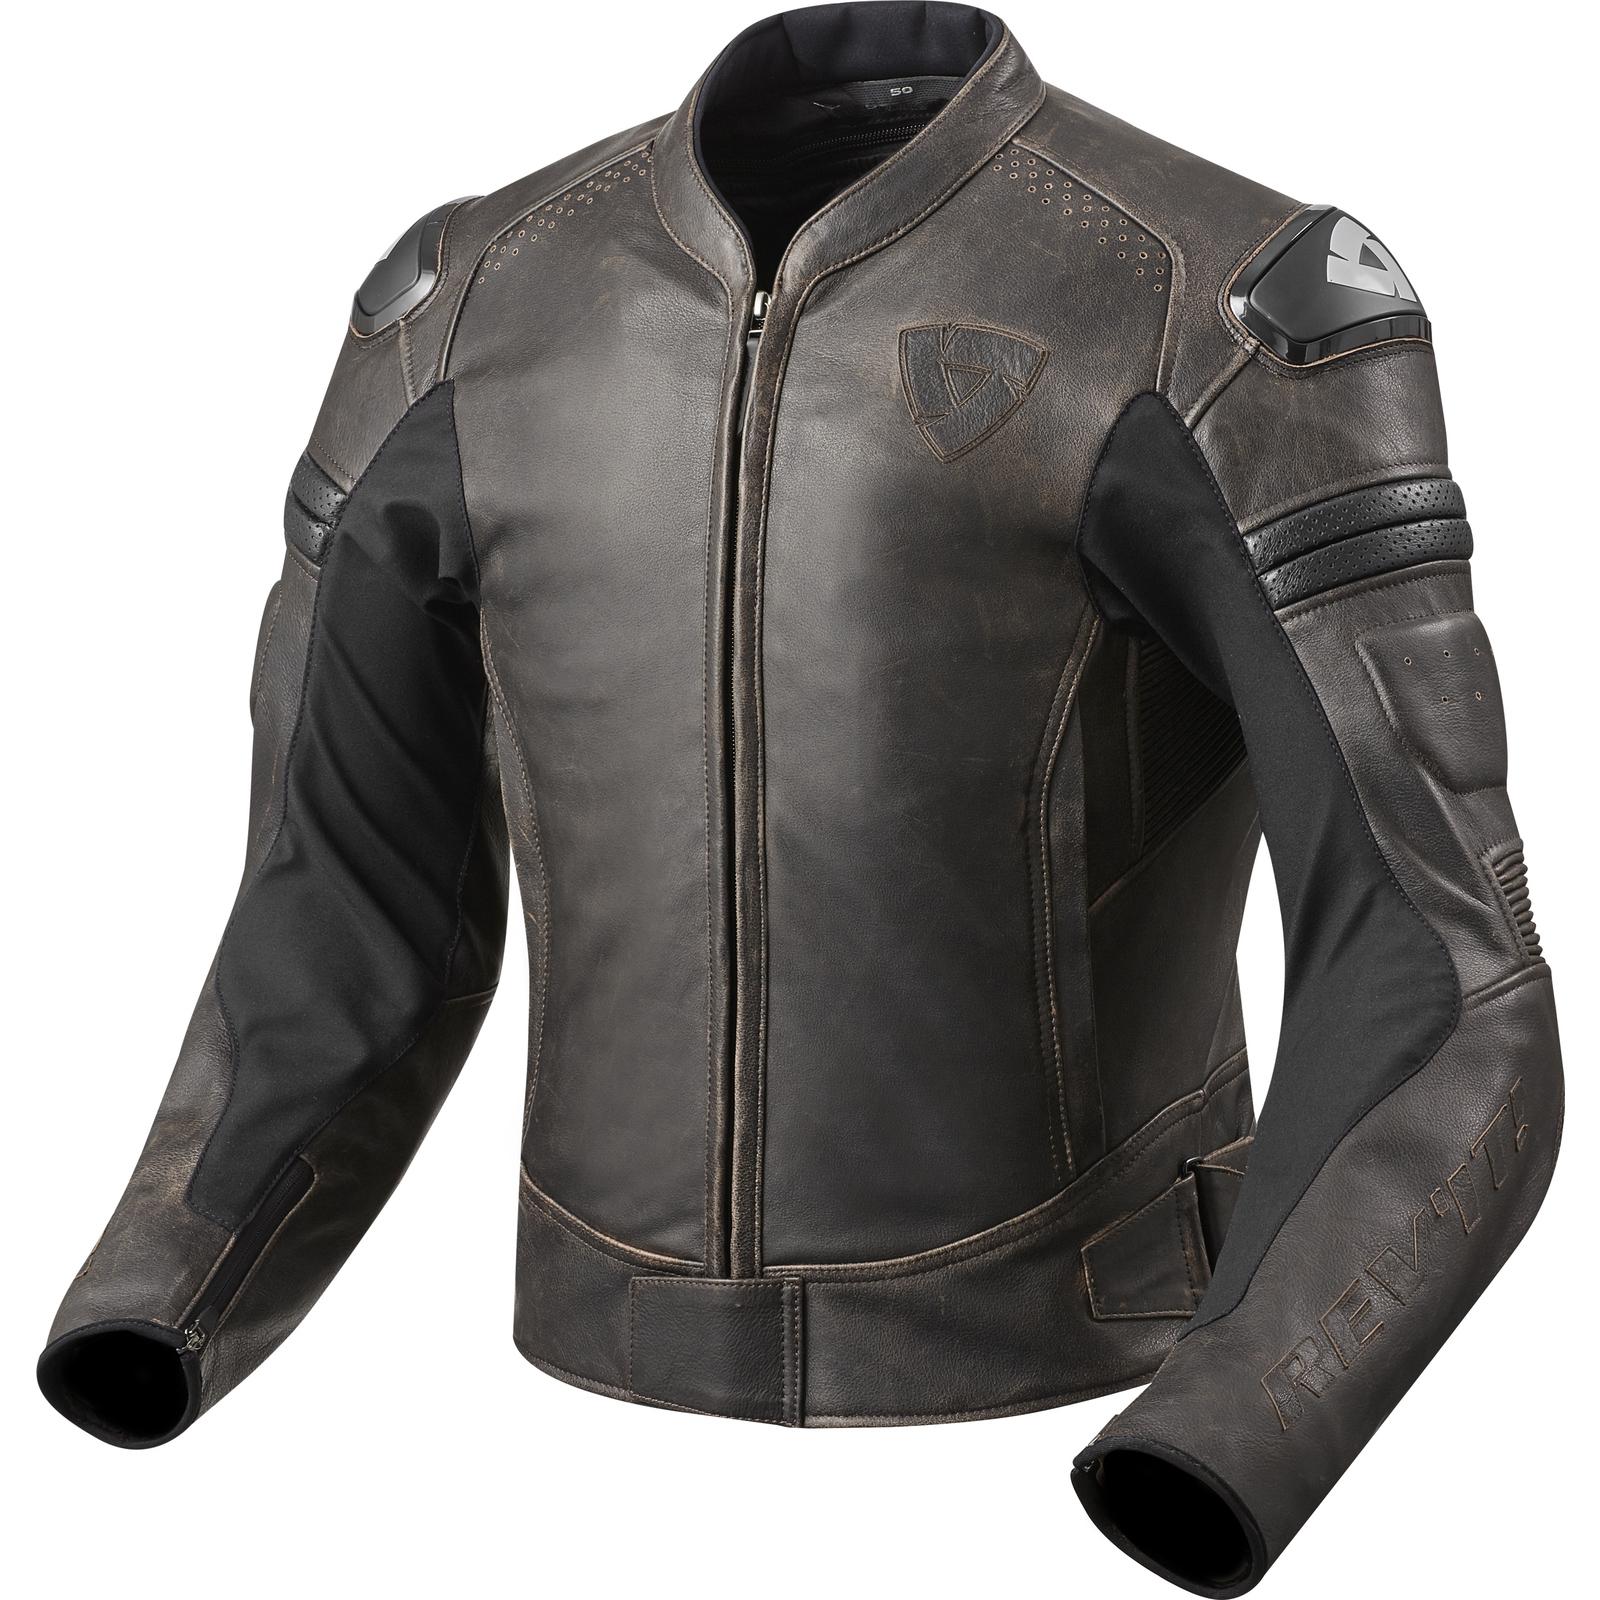 Vintage leather motorcycle jacket aOocZyg